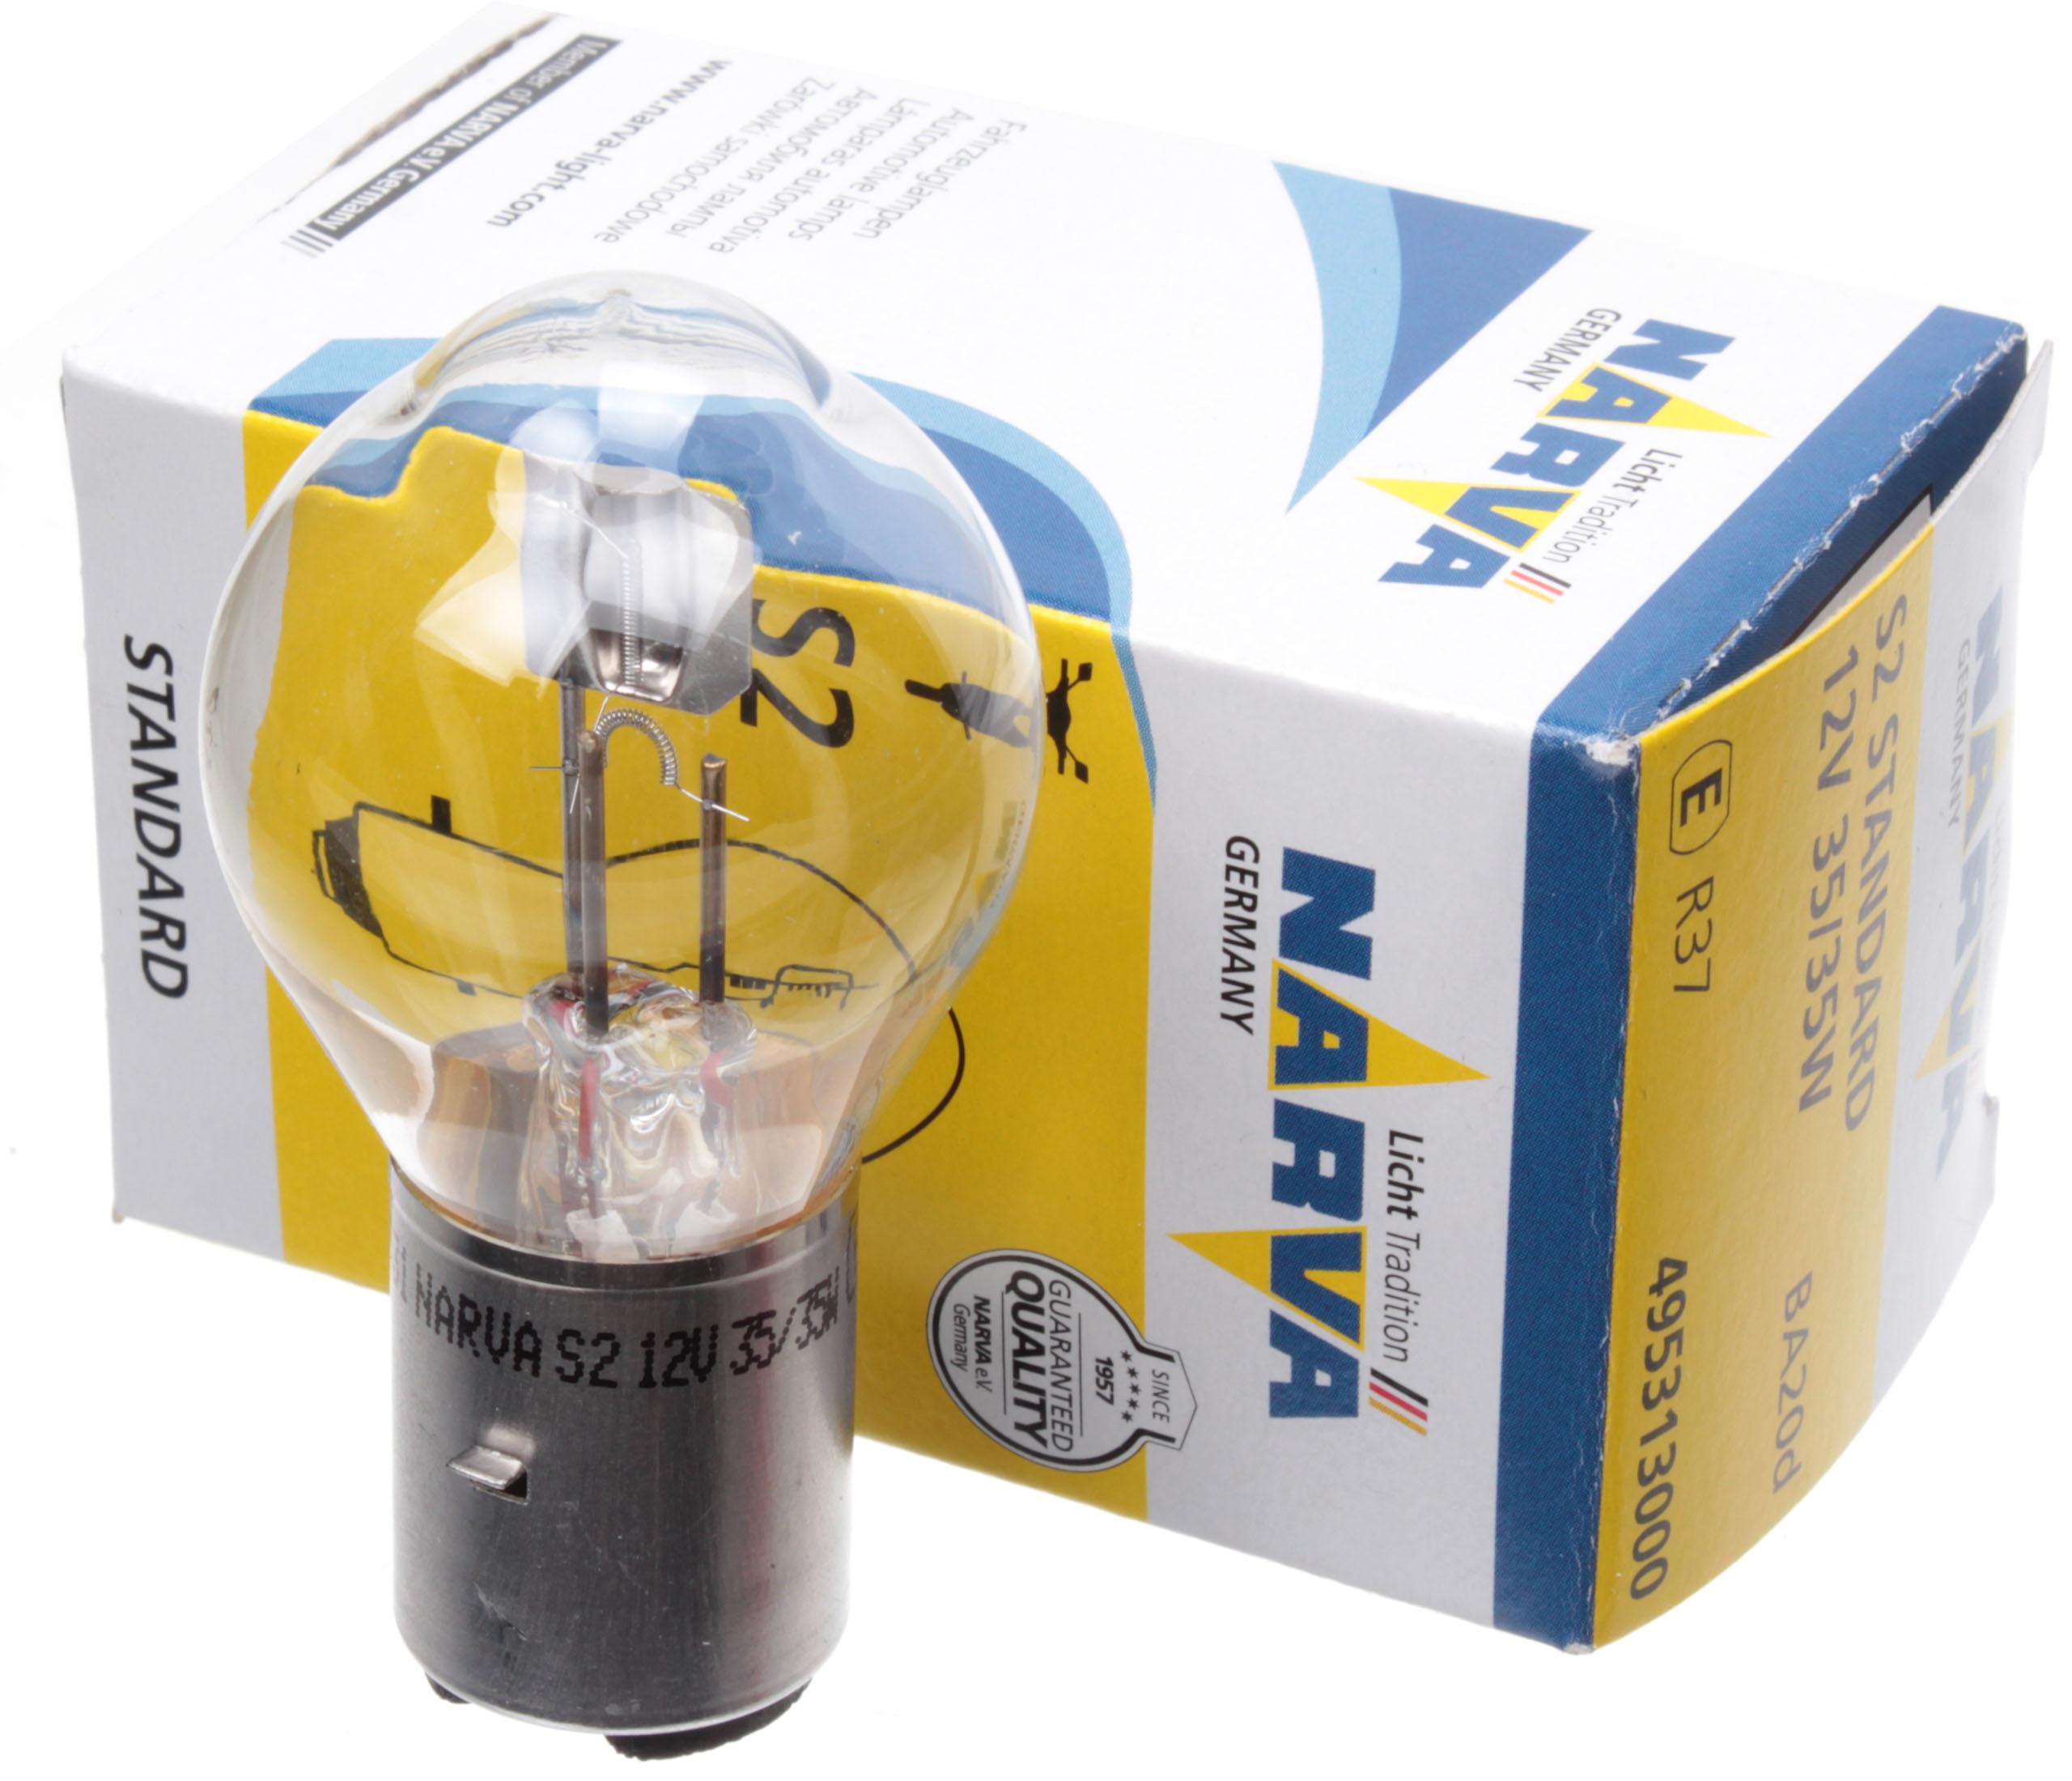 SIMSON MZ JAWA THE LAMP S2 12V 35/35W BA20D NARVA D